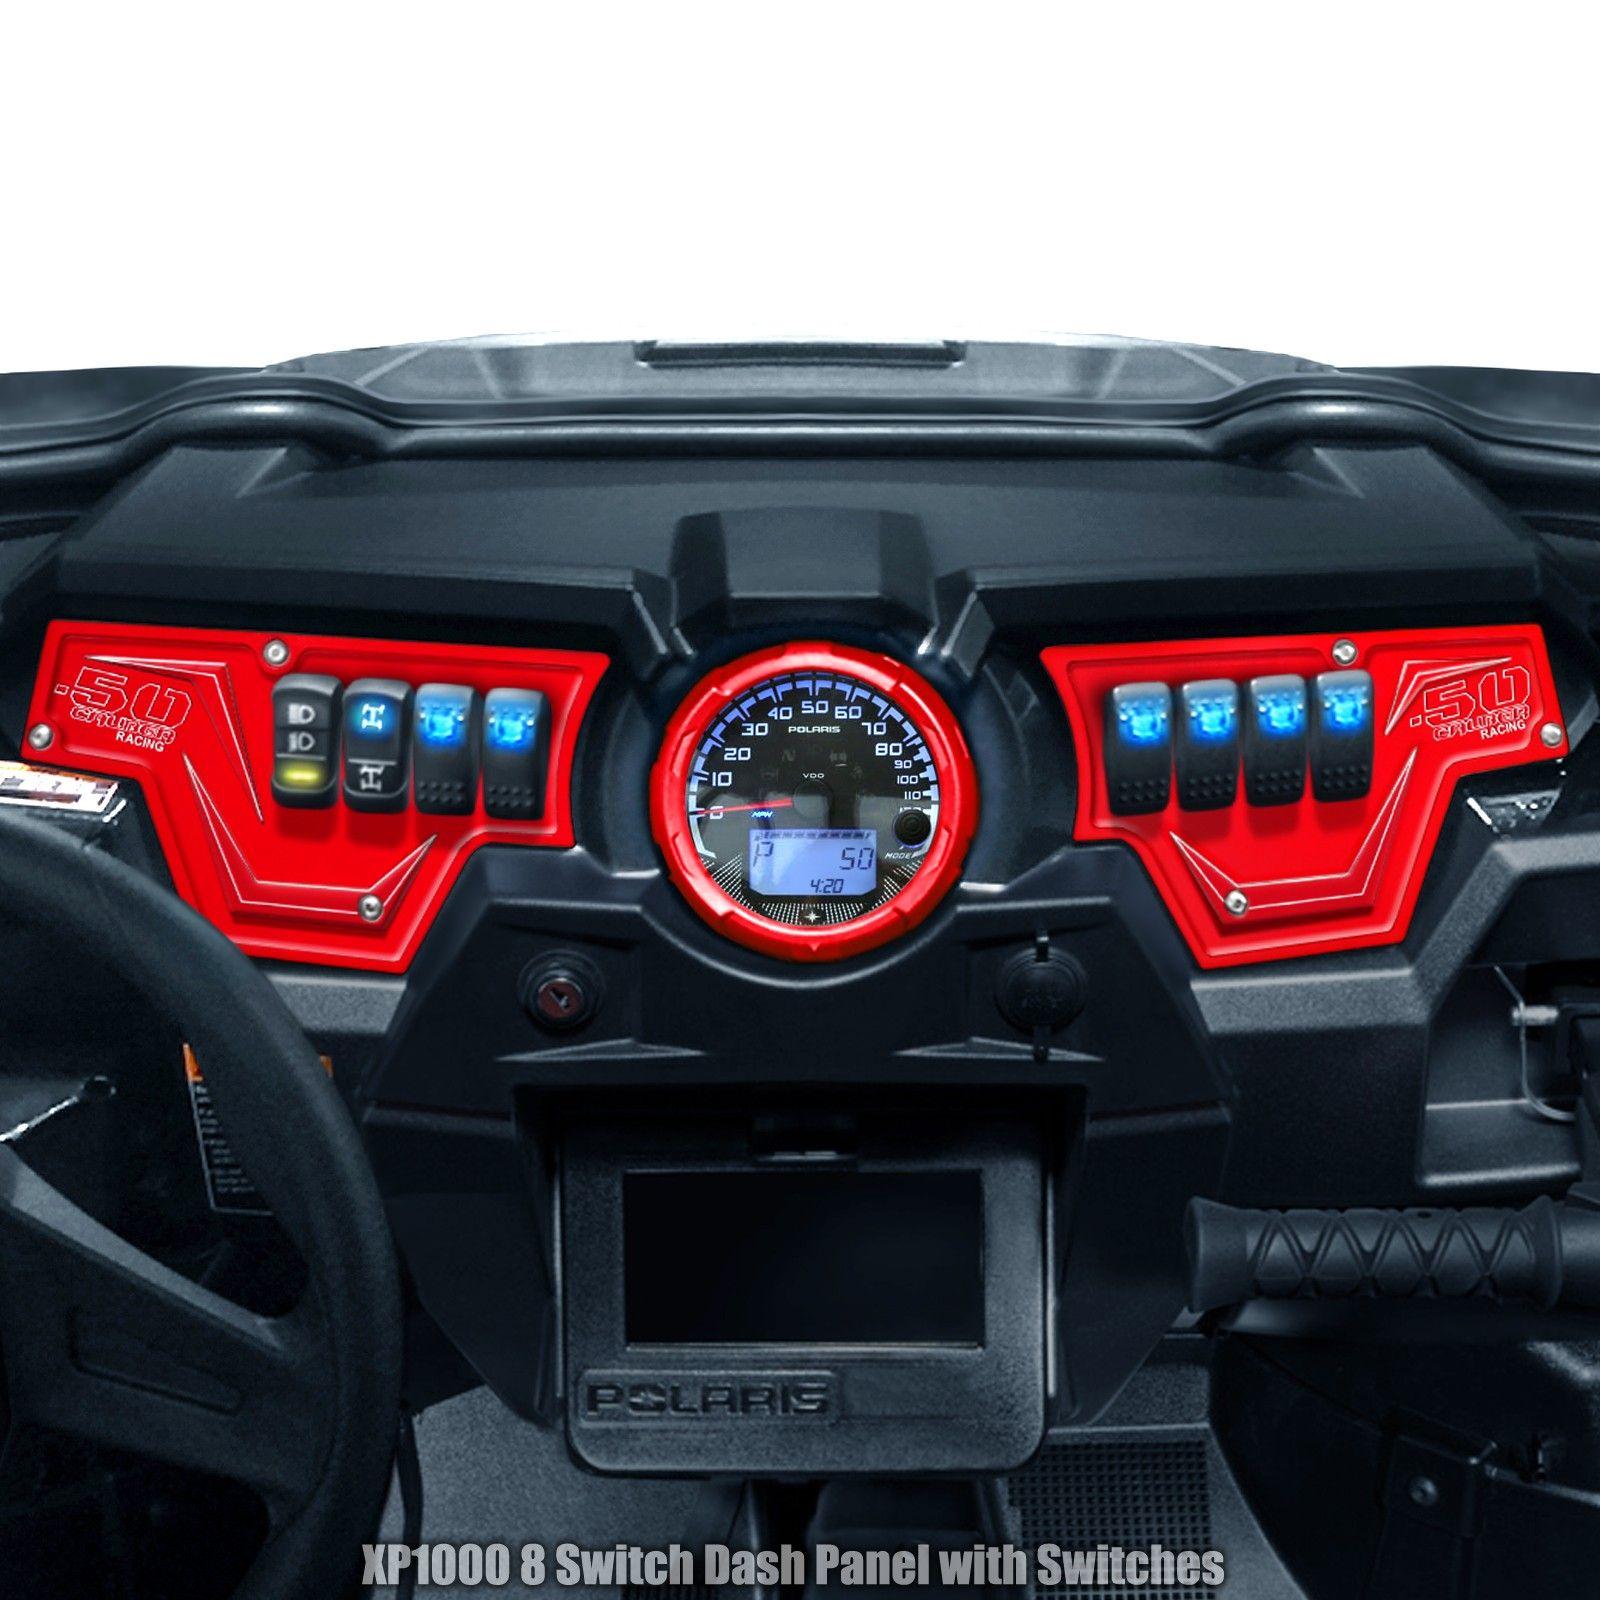 Polaris Xp1000 Cnc Billet Aluminum 8 Switch Dash Panel